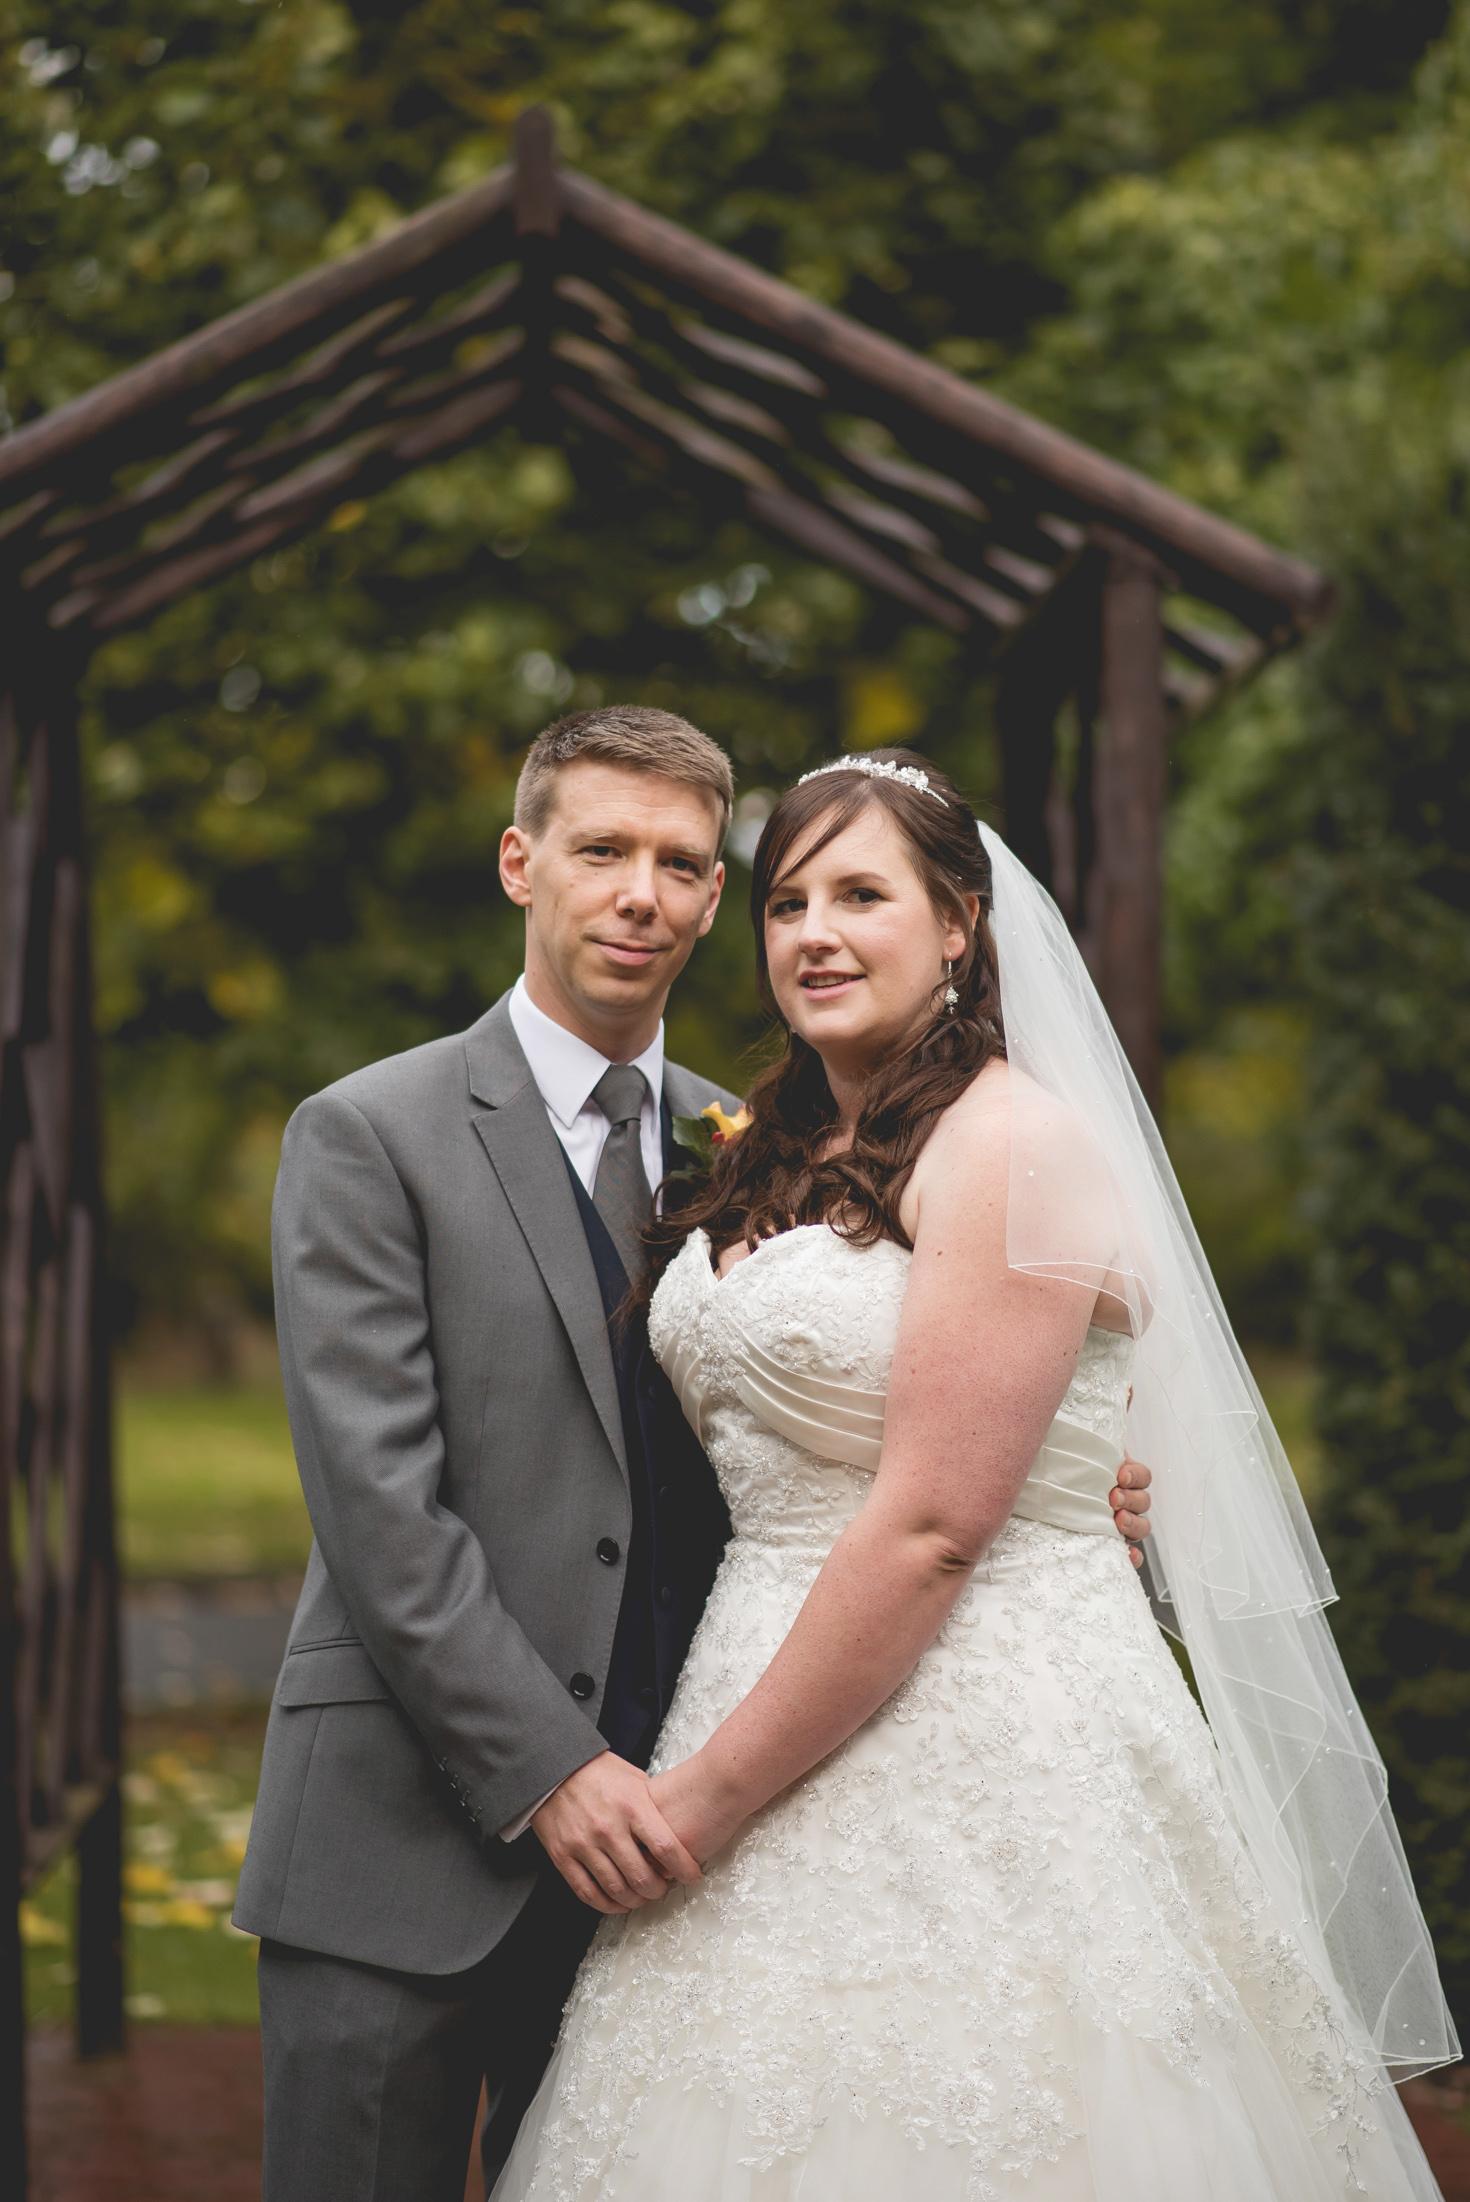 The+Fairlawns+wedding+Aldridge+StLukes+Church-170.jpg